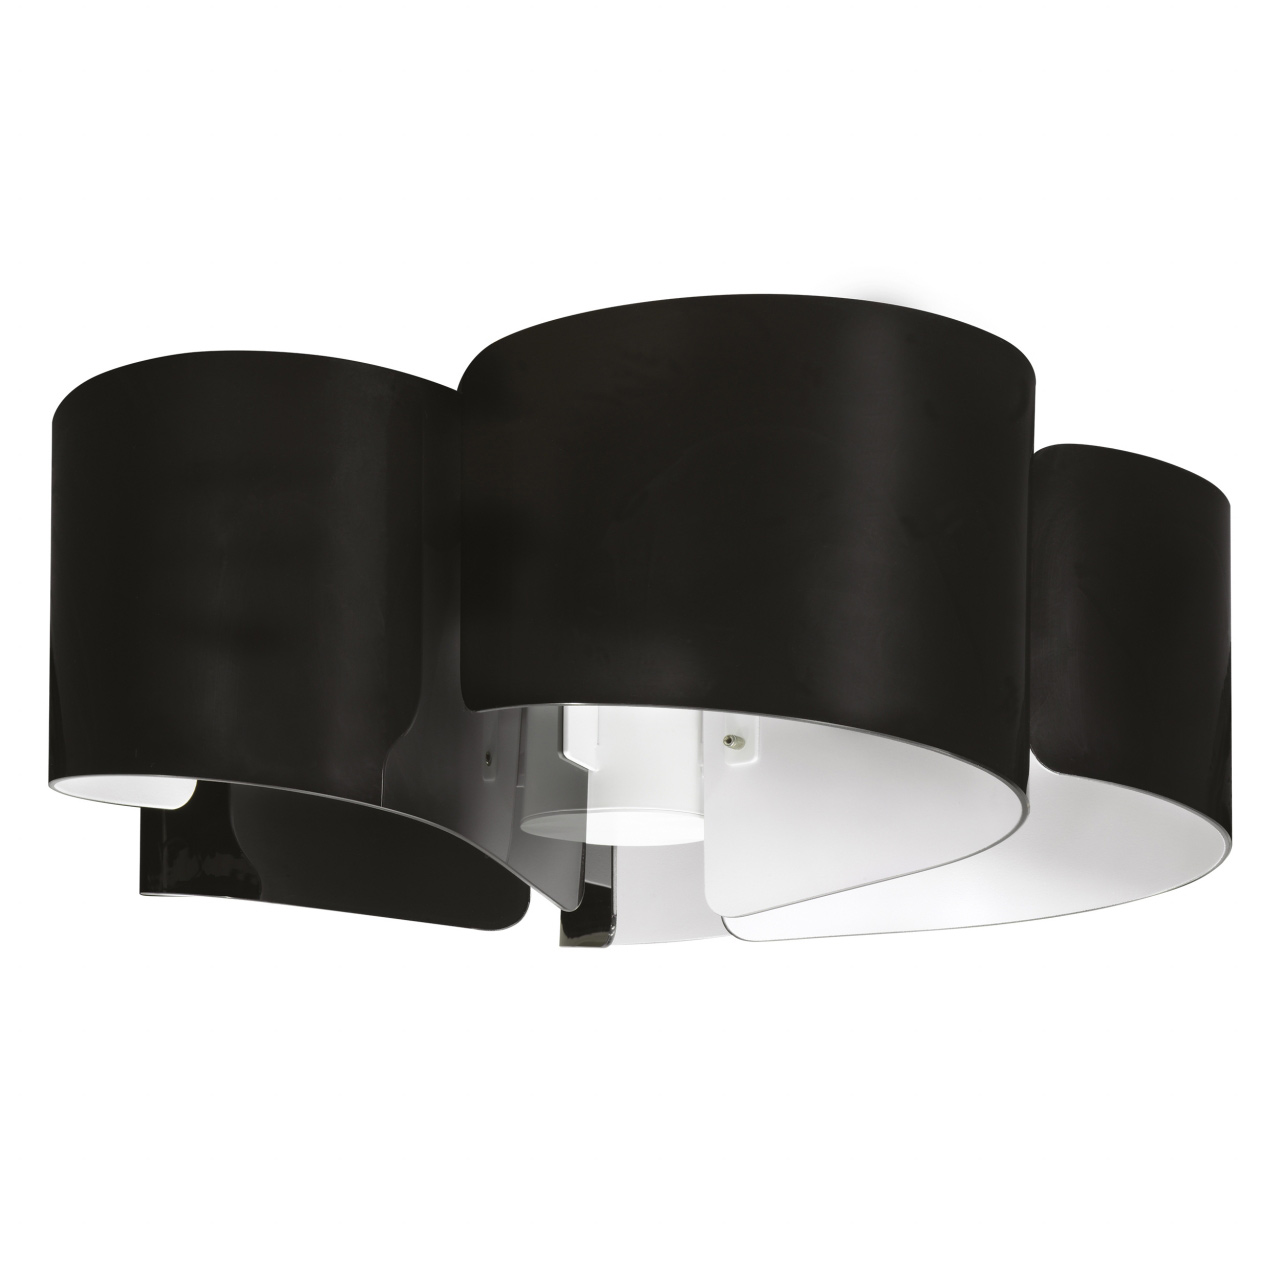 Люстра потолочная Pittore 5х40W E27 черный / белый Lightstar 811057